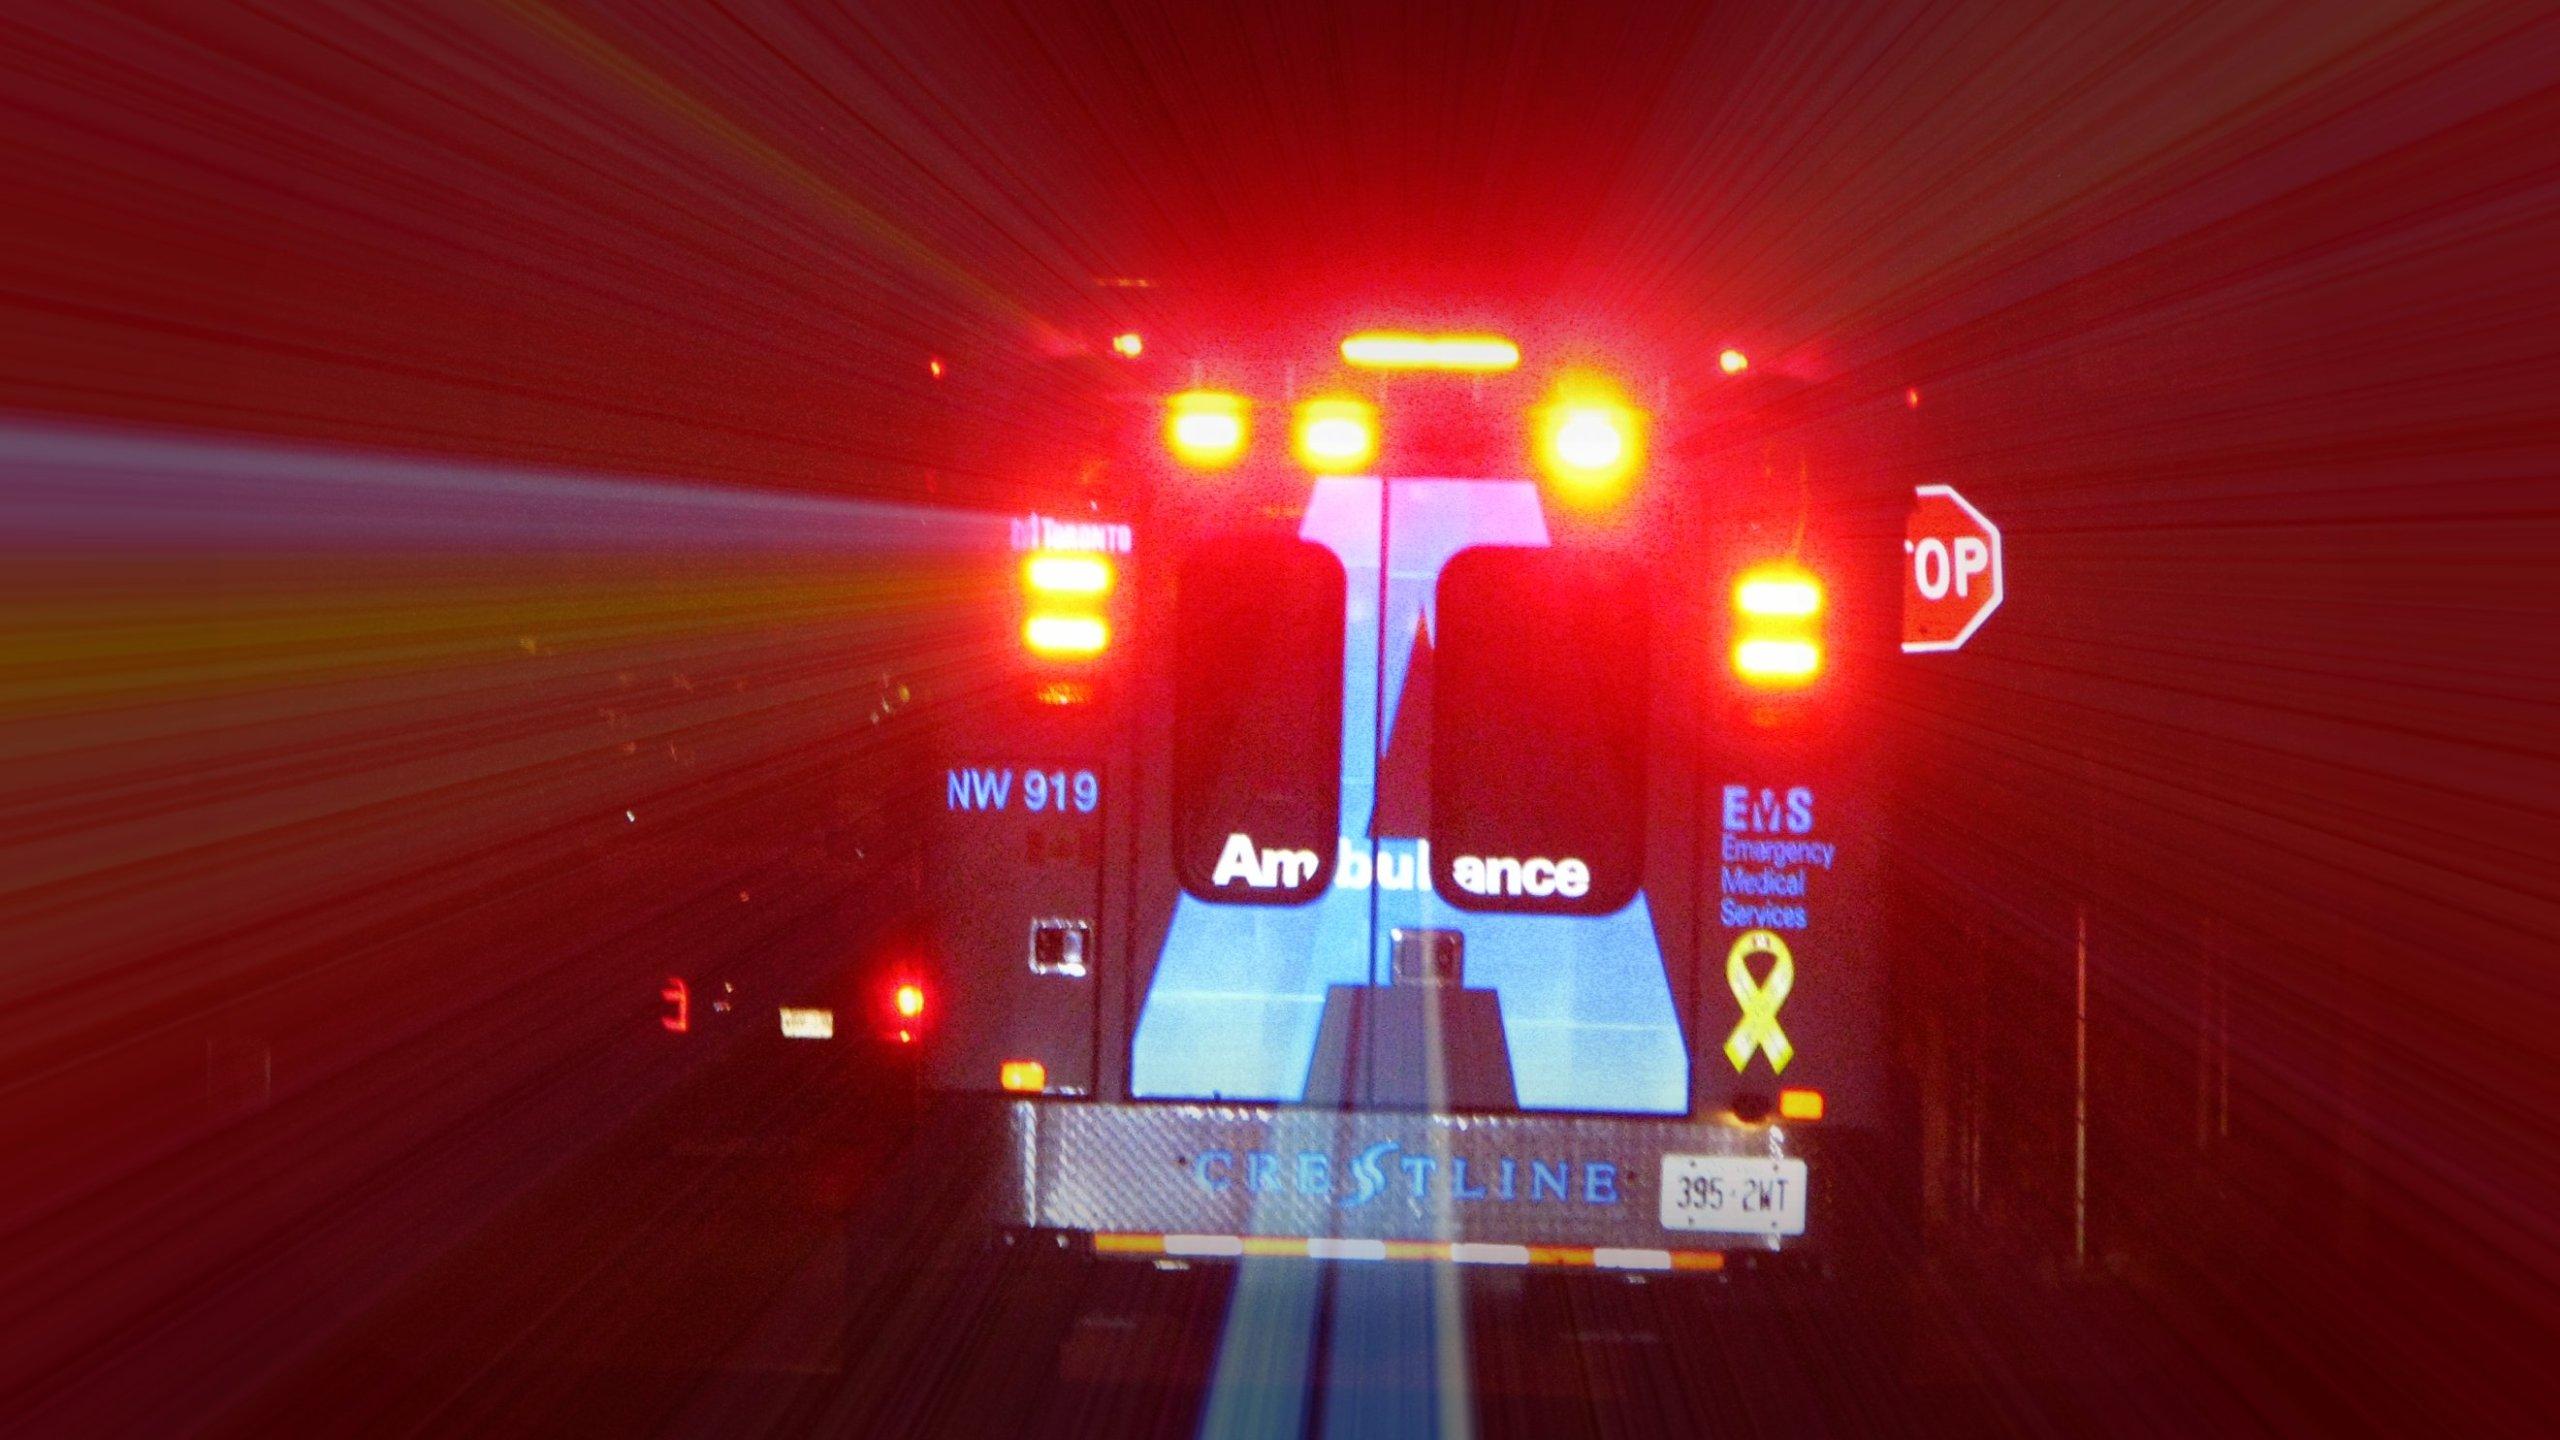 Ambulance_Toronto_March_2010_(1)_1504790149722.jpg